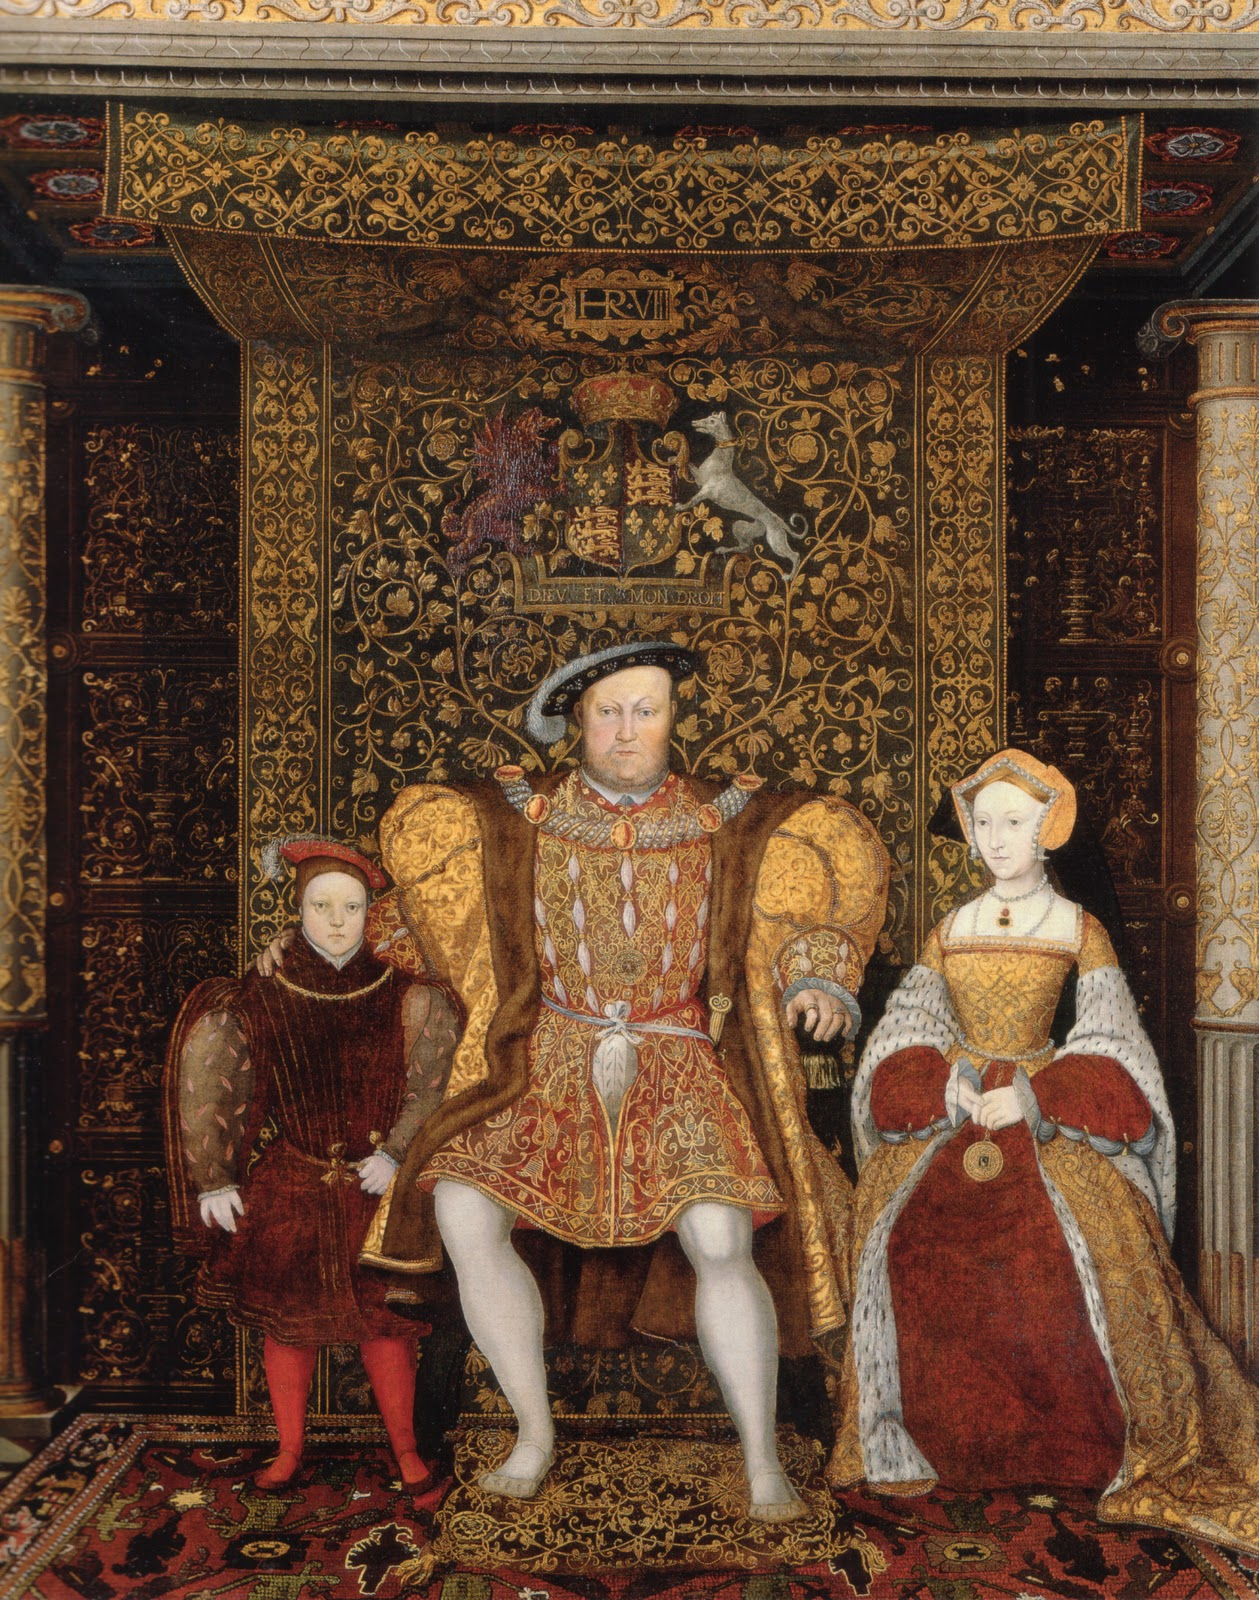 http://1.bp.blogspot.com/-hcssxobCQpQ/TugDfxsto7I/AAAAAAAAJuA/-pXEUG_TUeY/s1600/Family_of_Henry_VIII_c_1545_detail.jpg